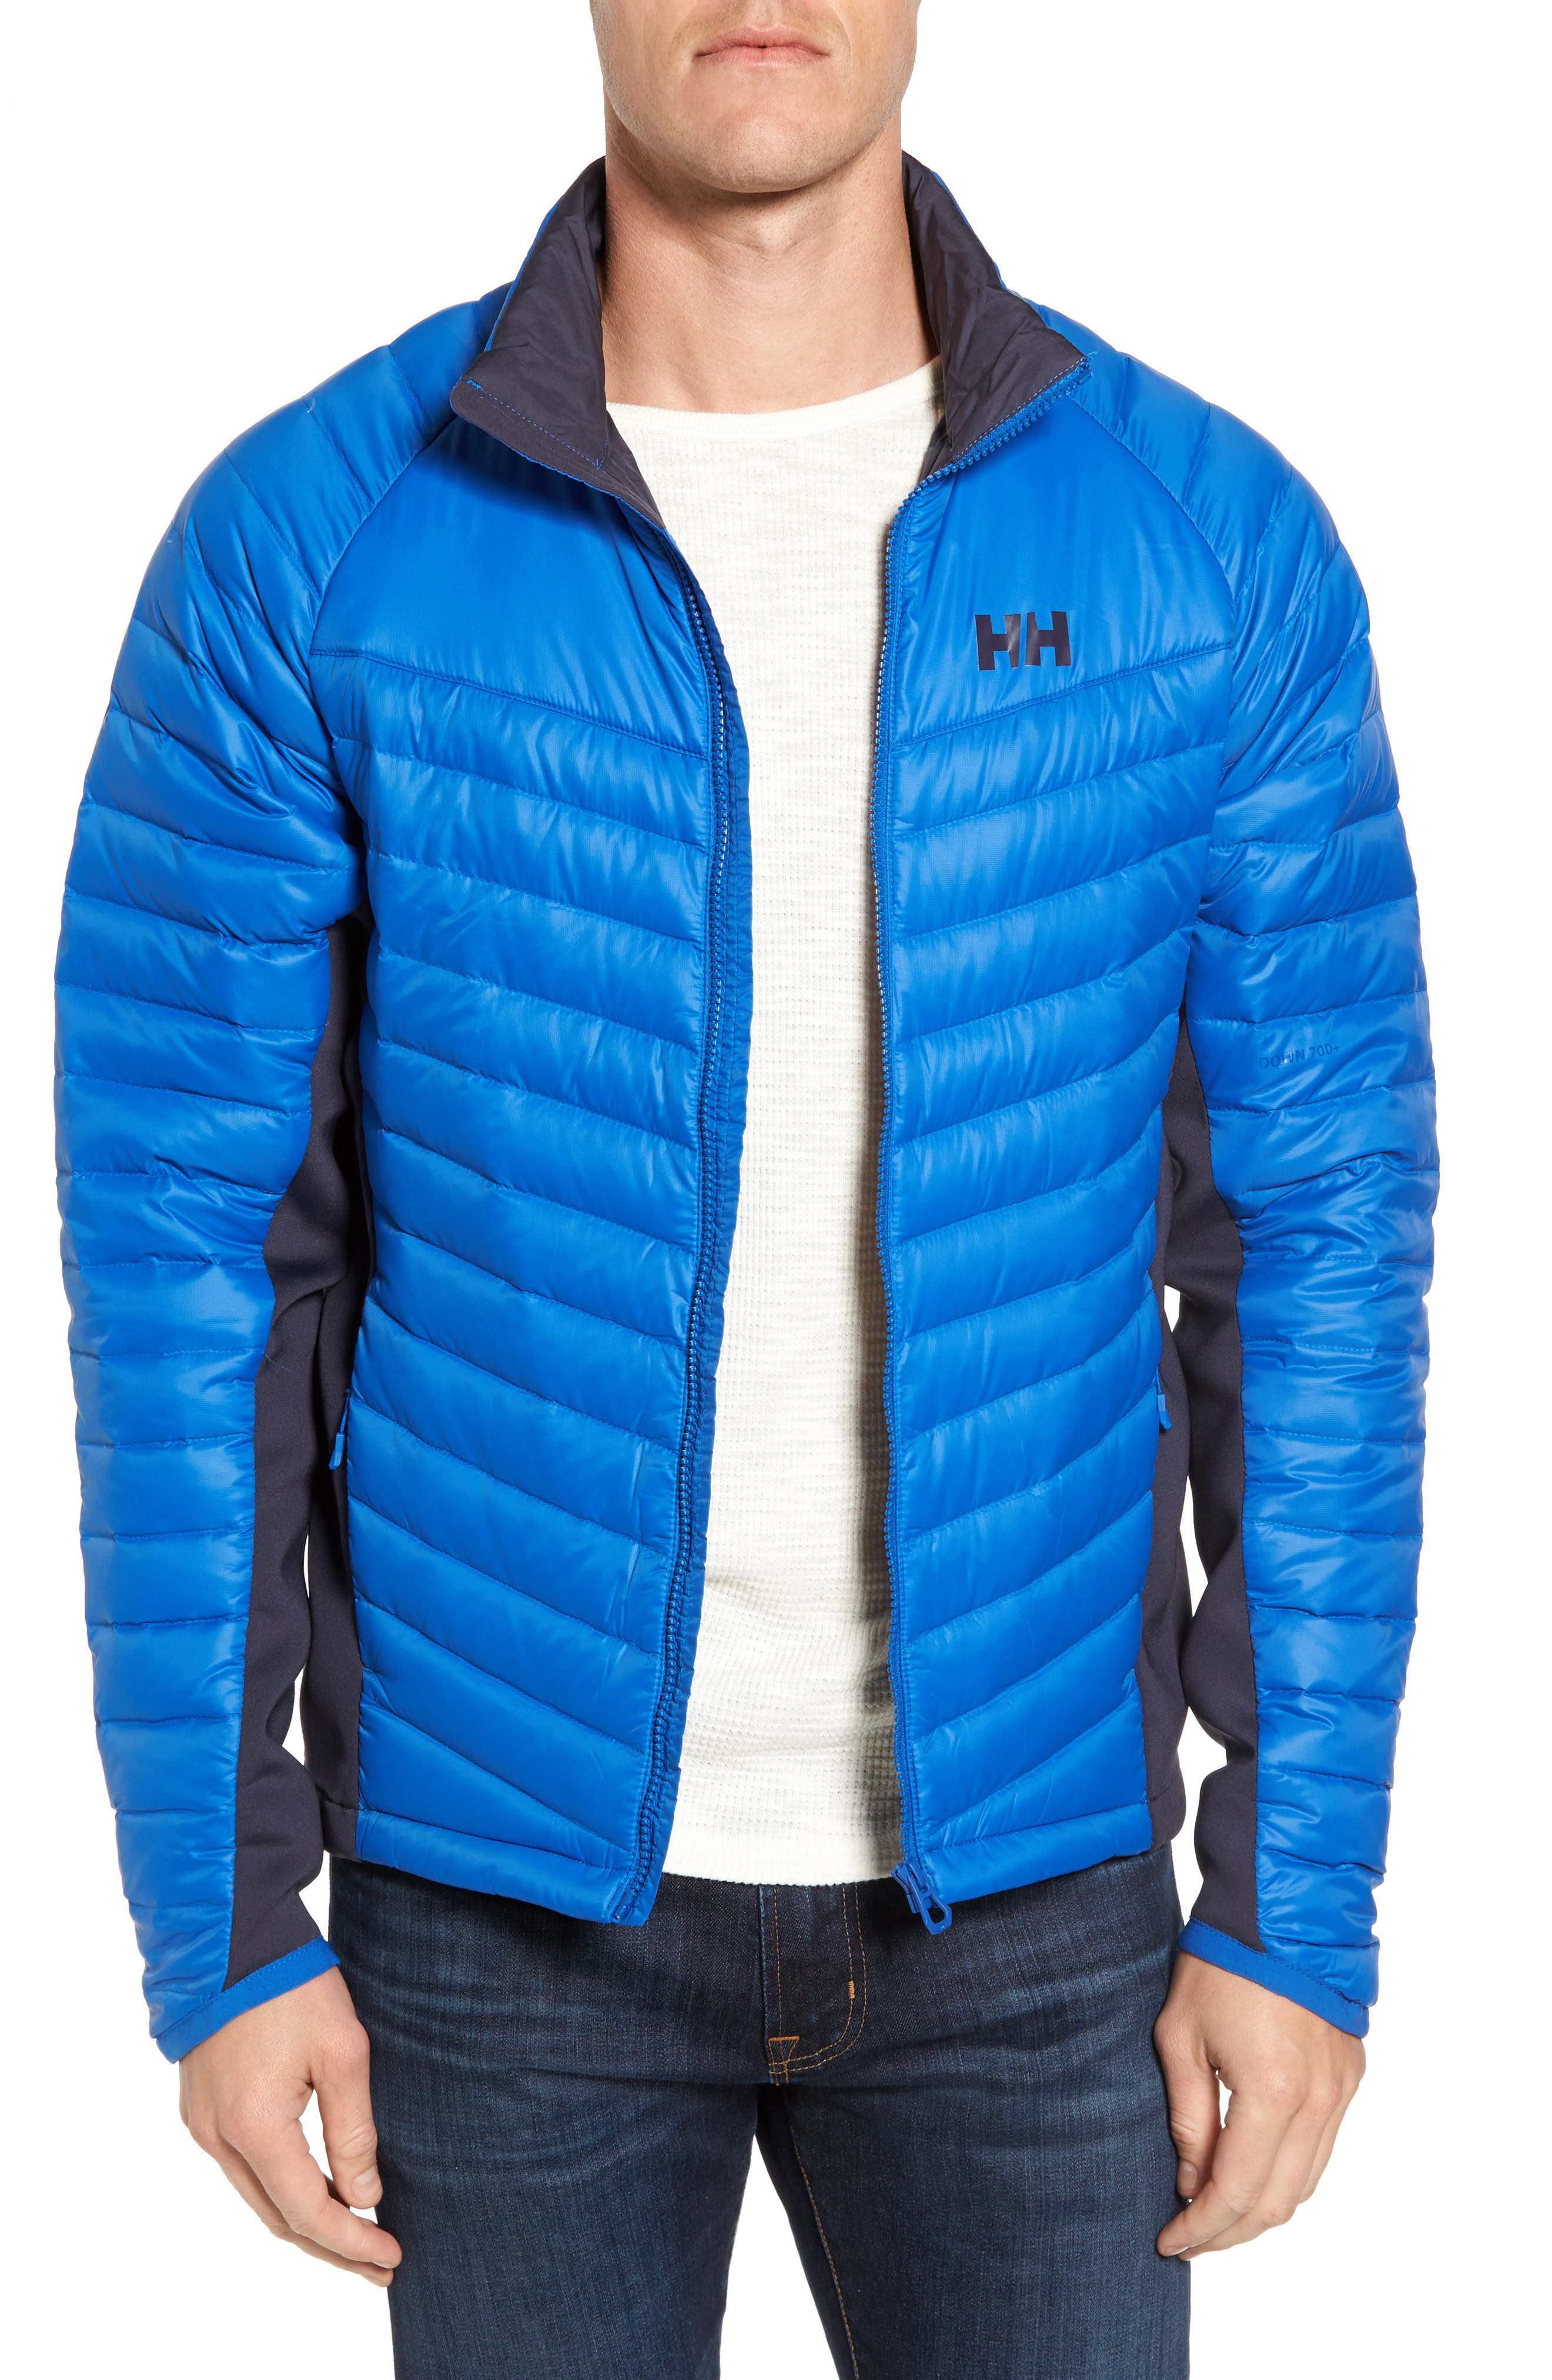 Main Image - Helly Hansen Verglas Insulator Hybrid Jacket